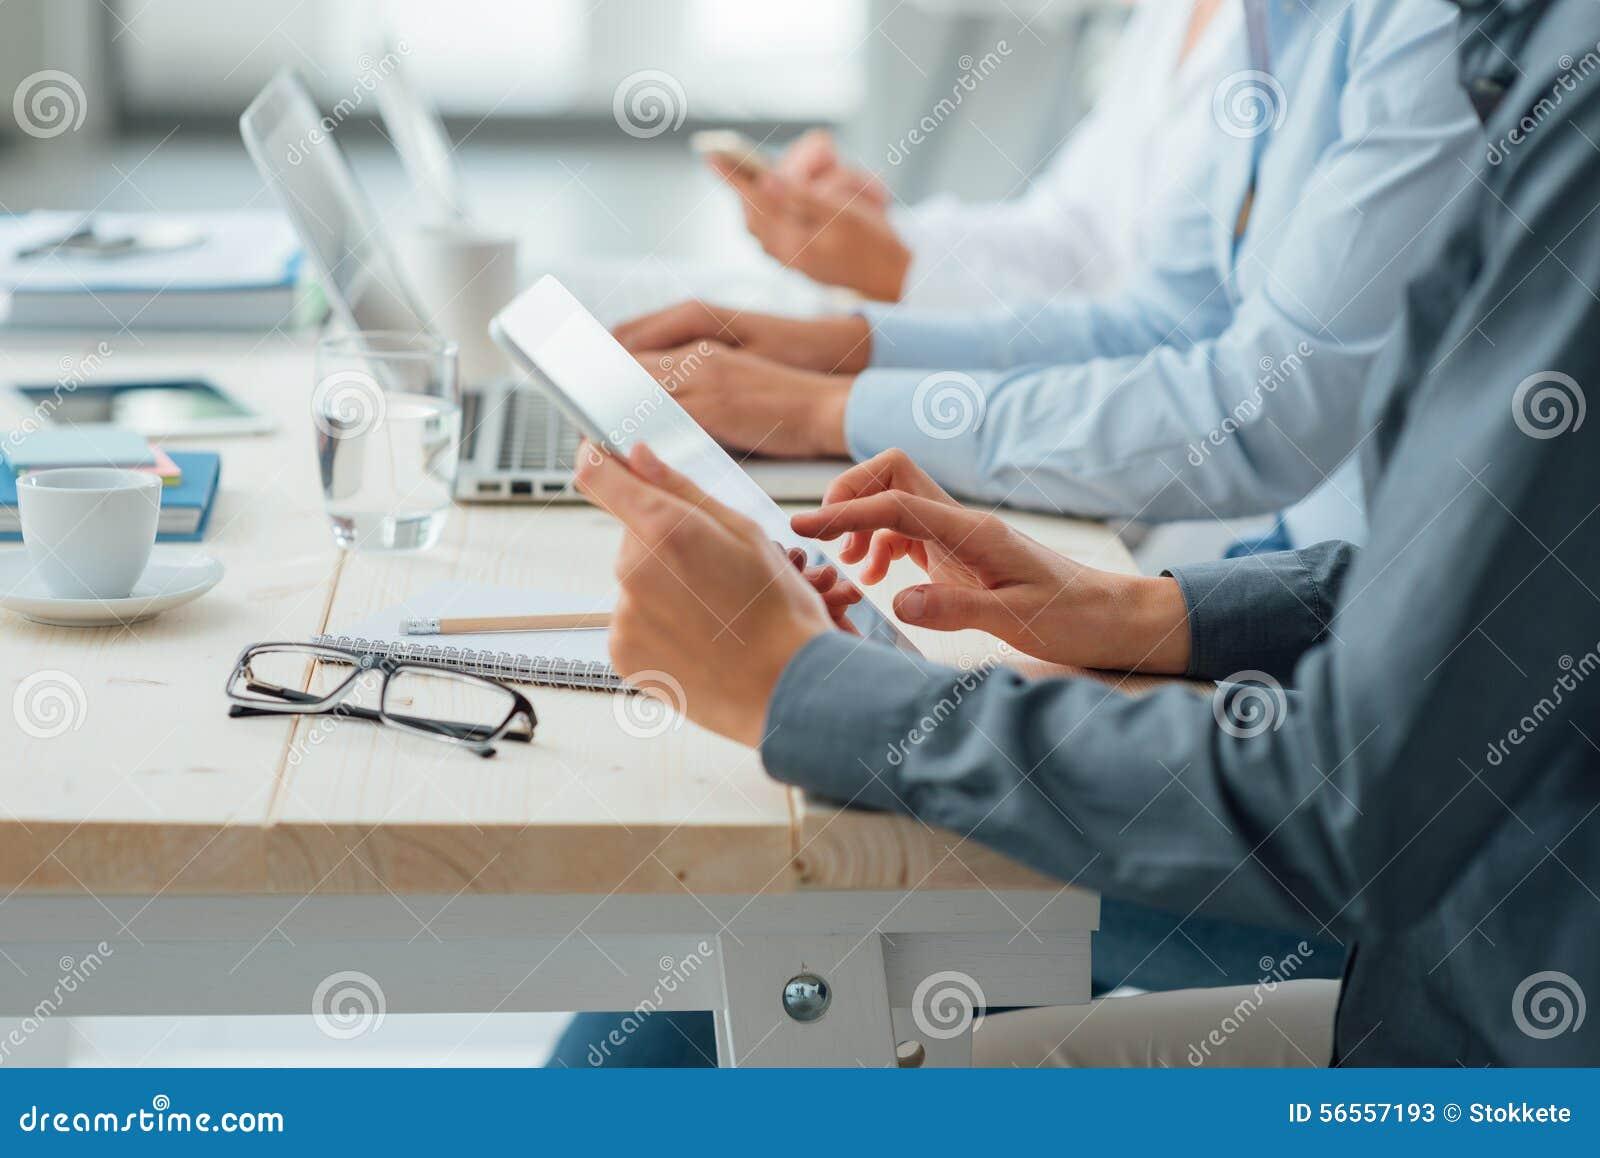 Download Επιχειρησιακή ομάδα που εργάζεται στο γραφείο γραφείων Στοκ Εικόνα - εικόνα από πείρα, επιχειρηματίας: 56557193